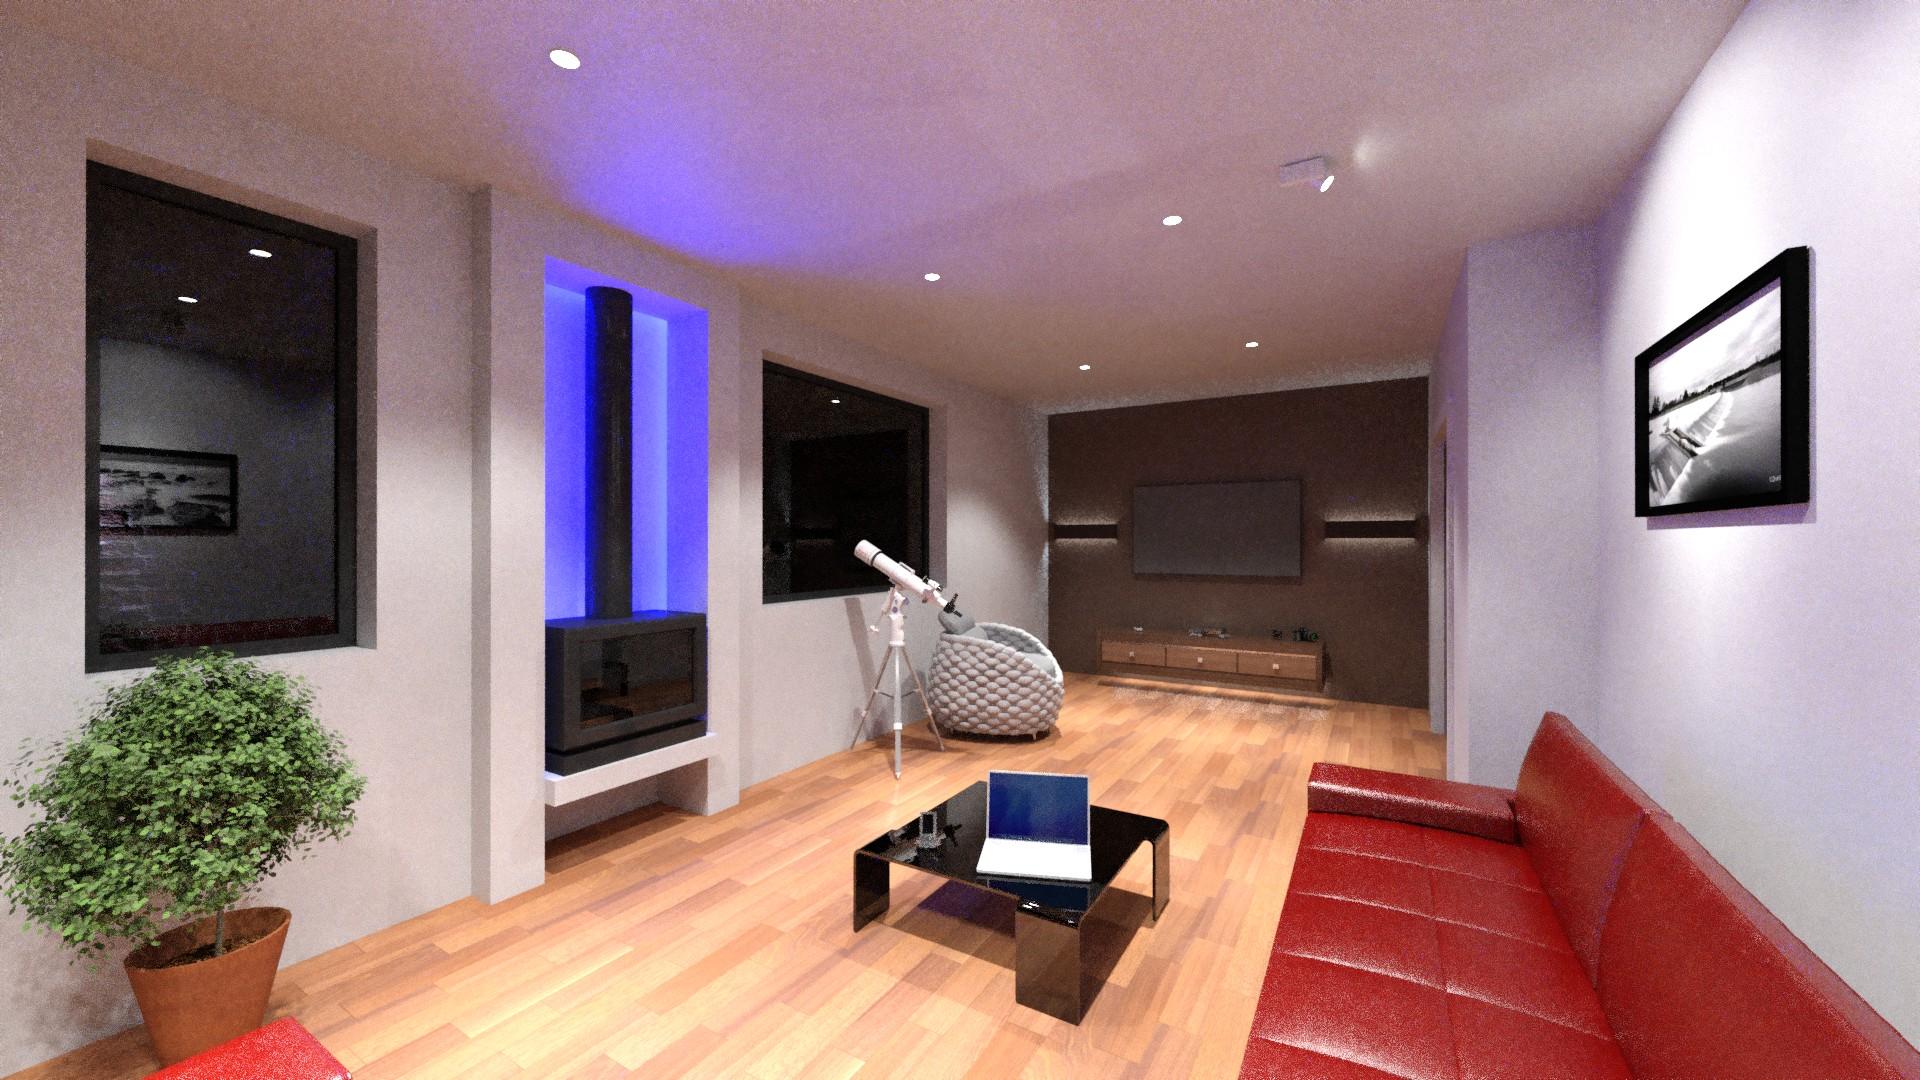 D visualization services on light design services